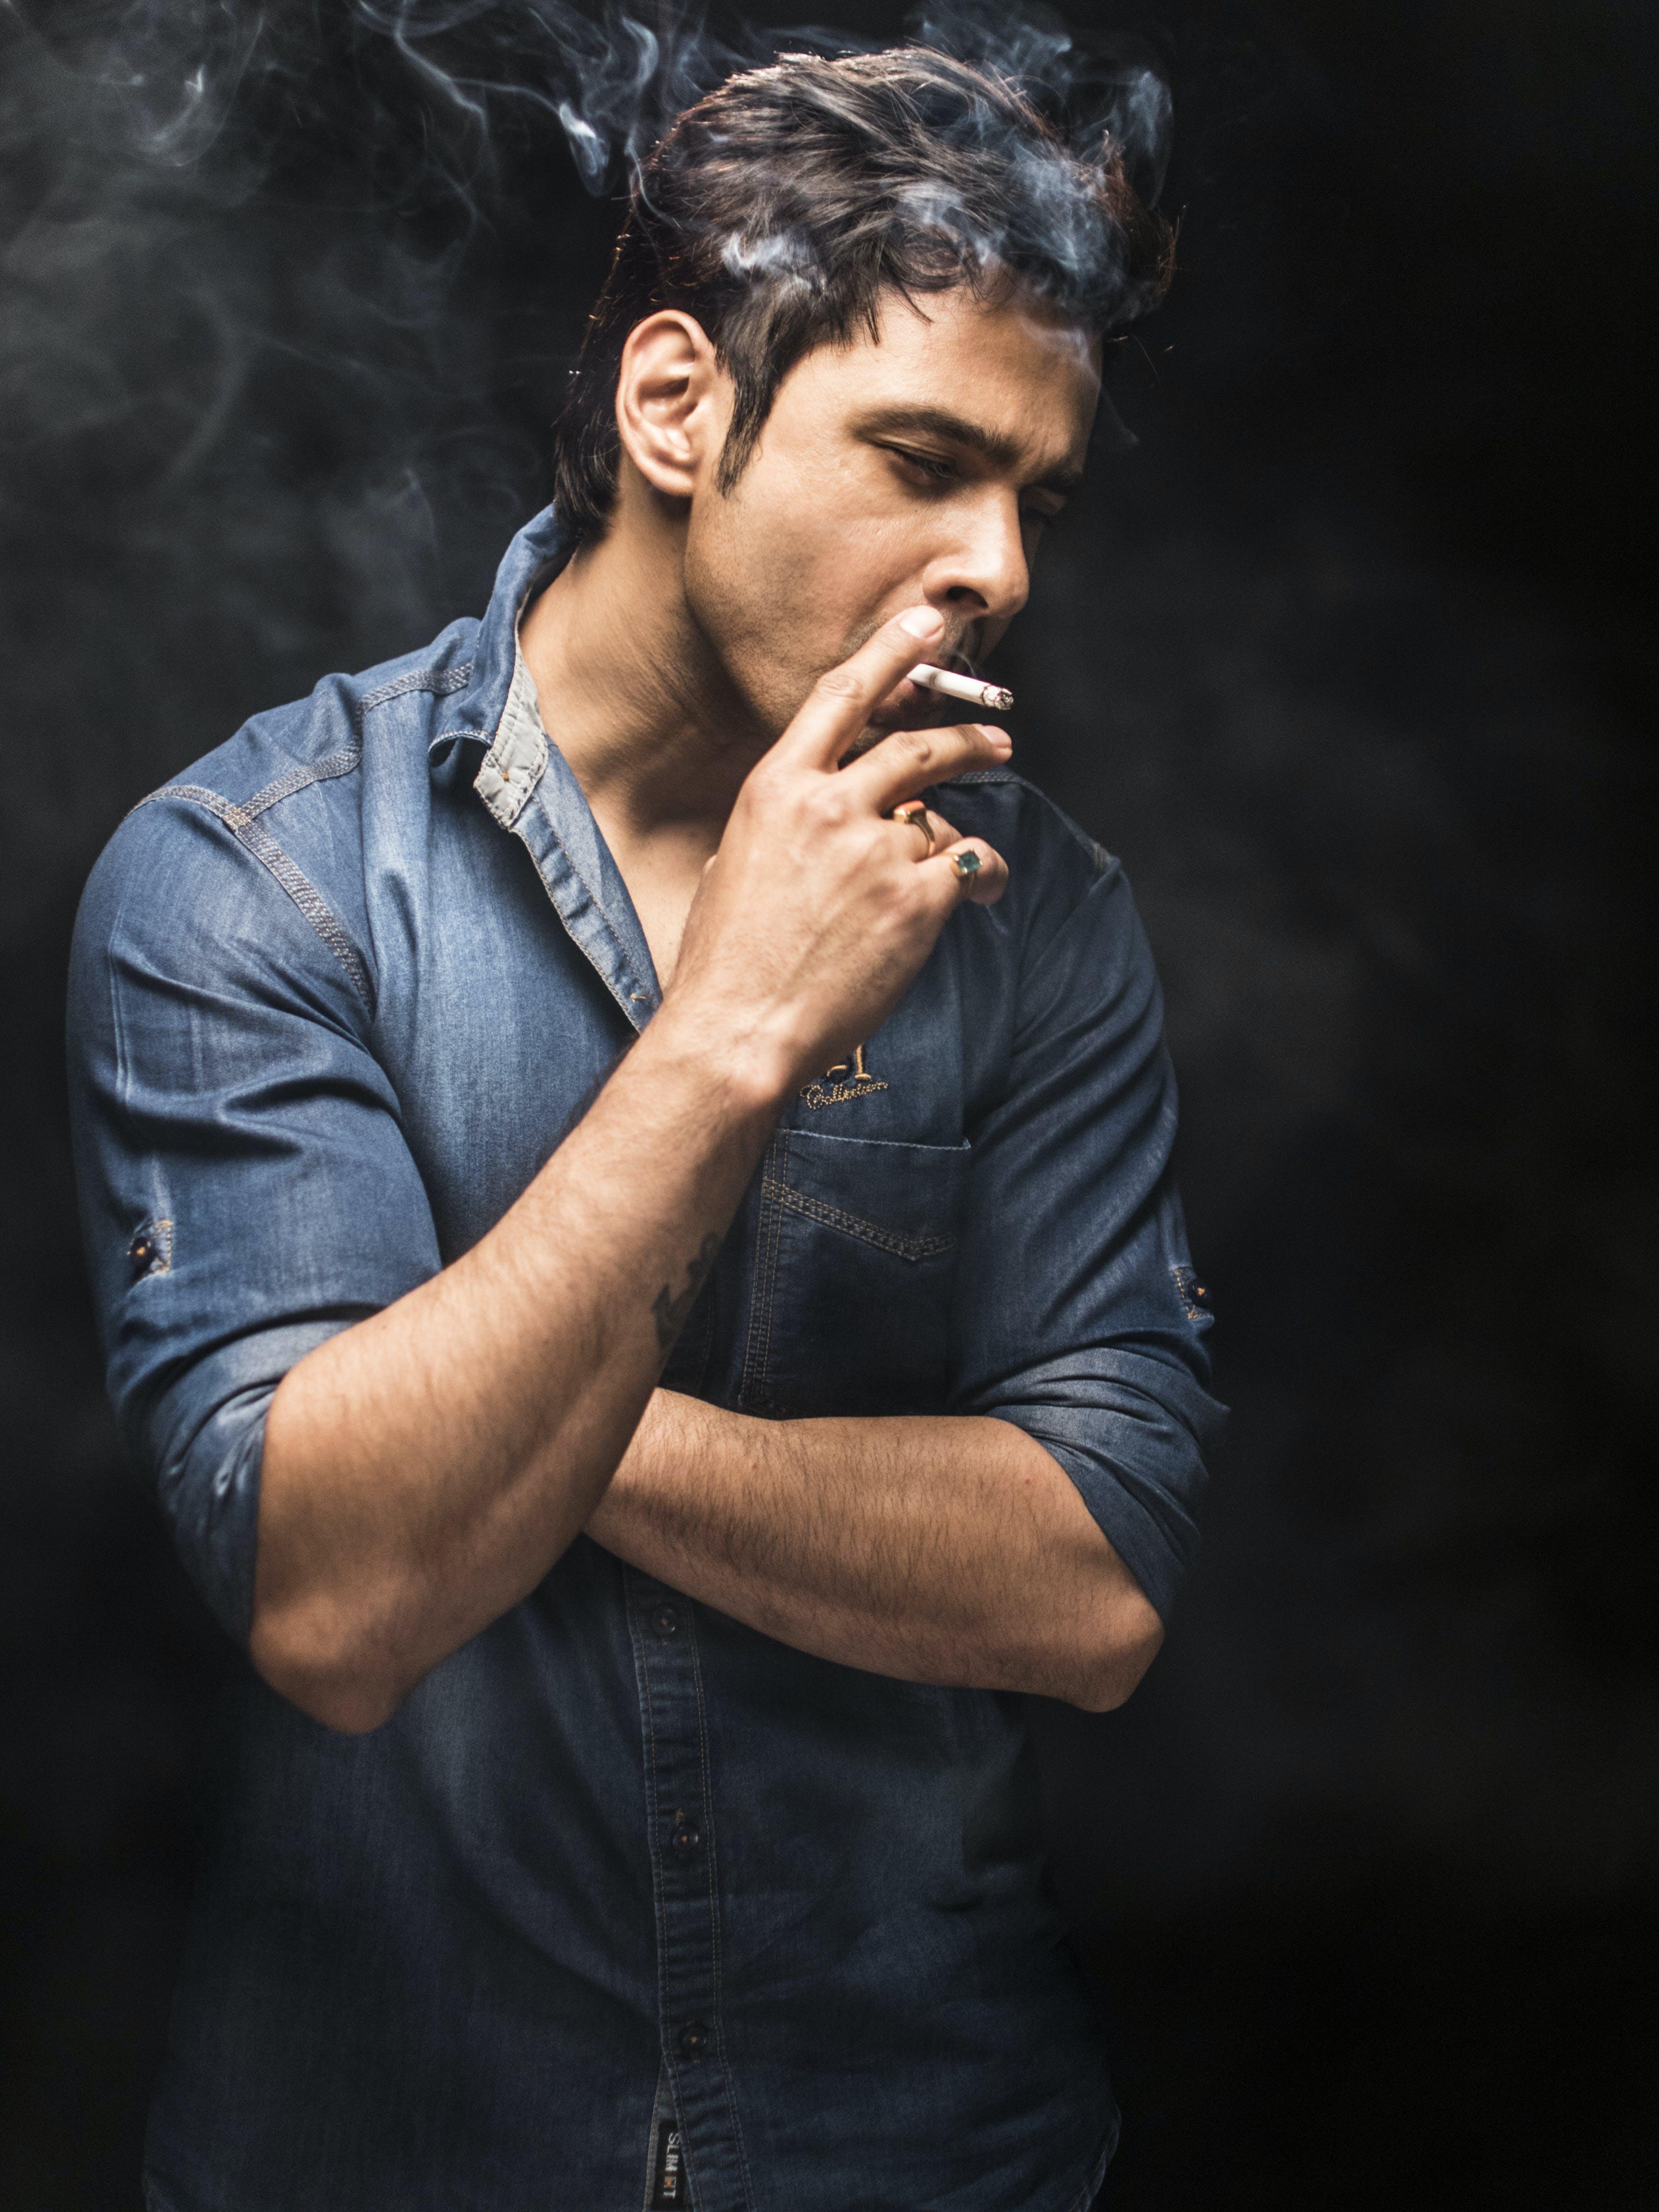 Man Smoking on Dark Background